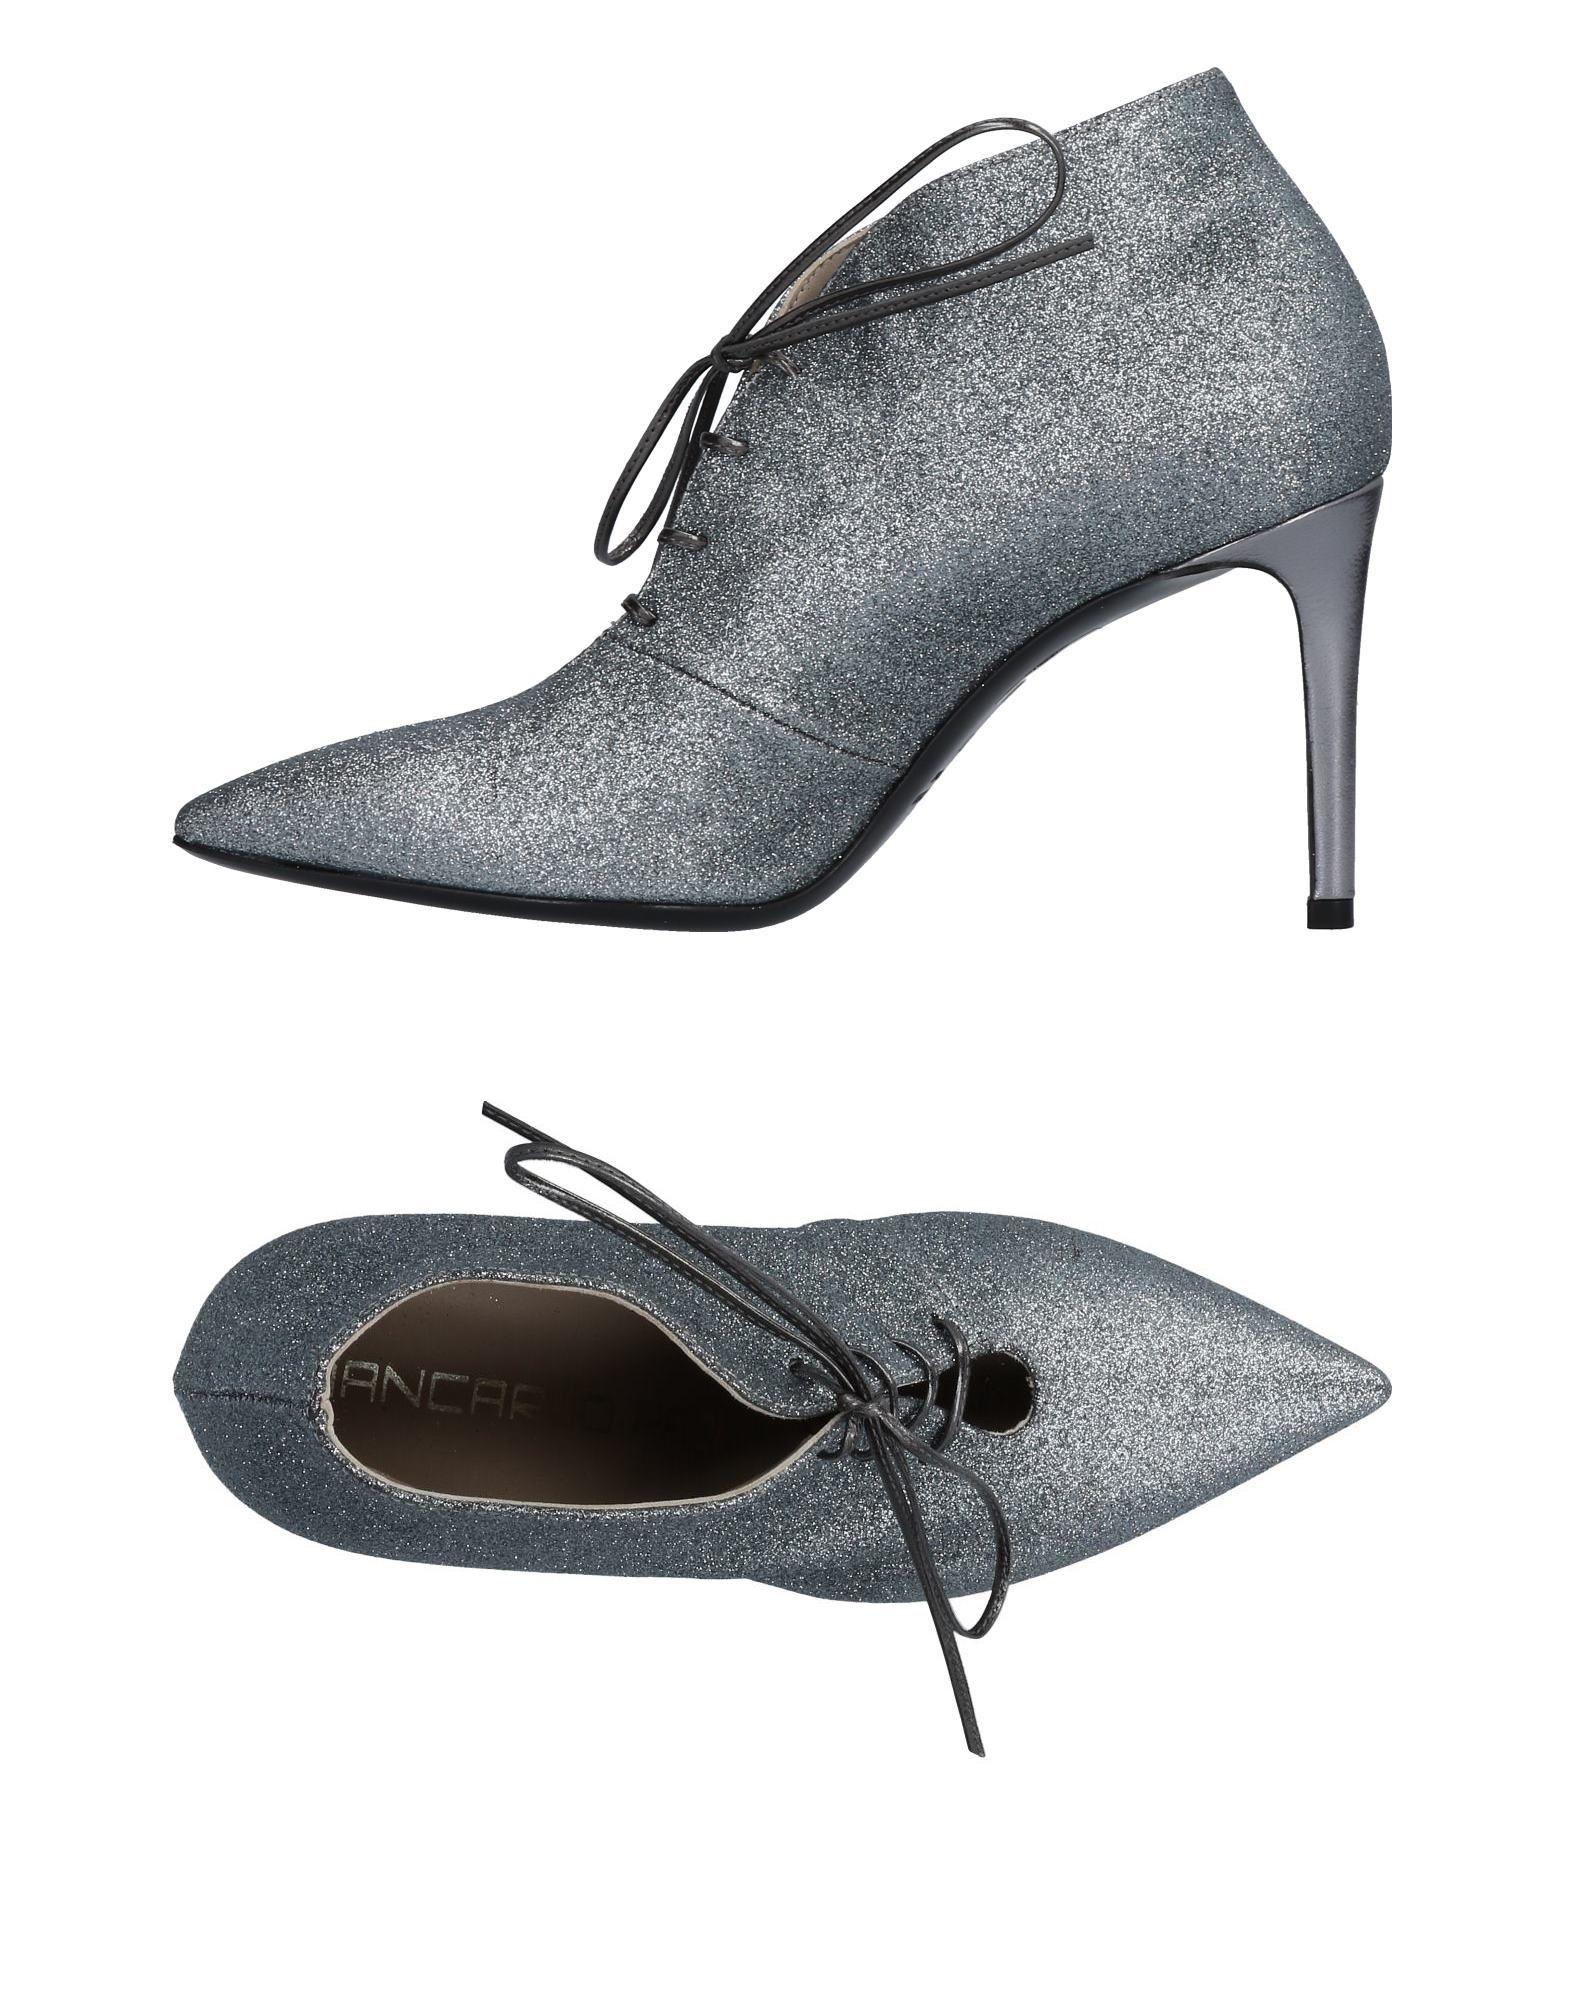 Stilvolle billige Schuhe Damen Giancarlo Paoli Schnürschuhe Damen Schuhe  11478939DI 296b68